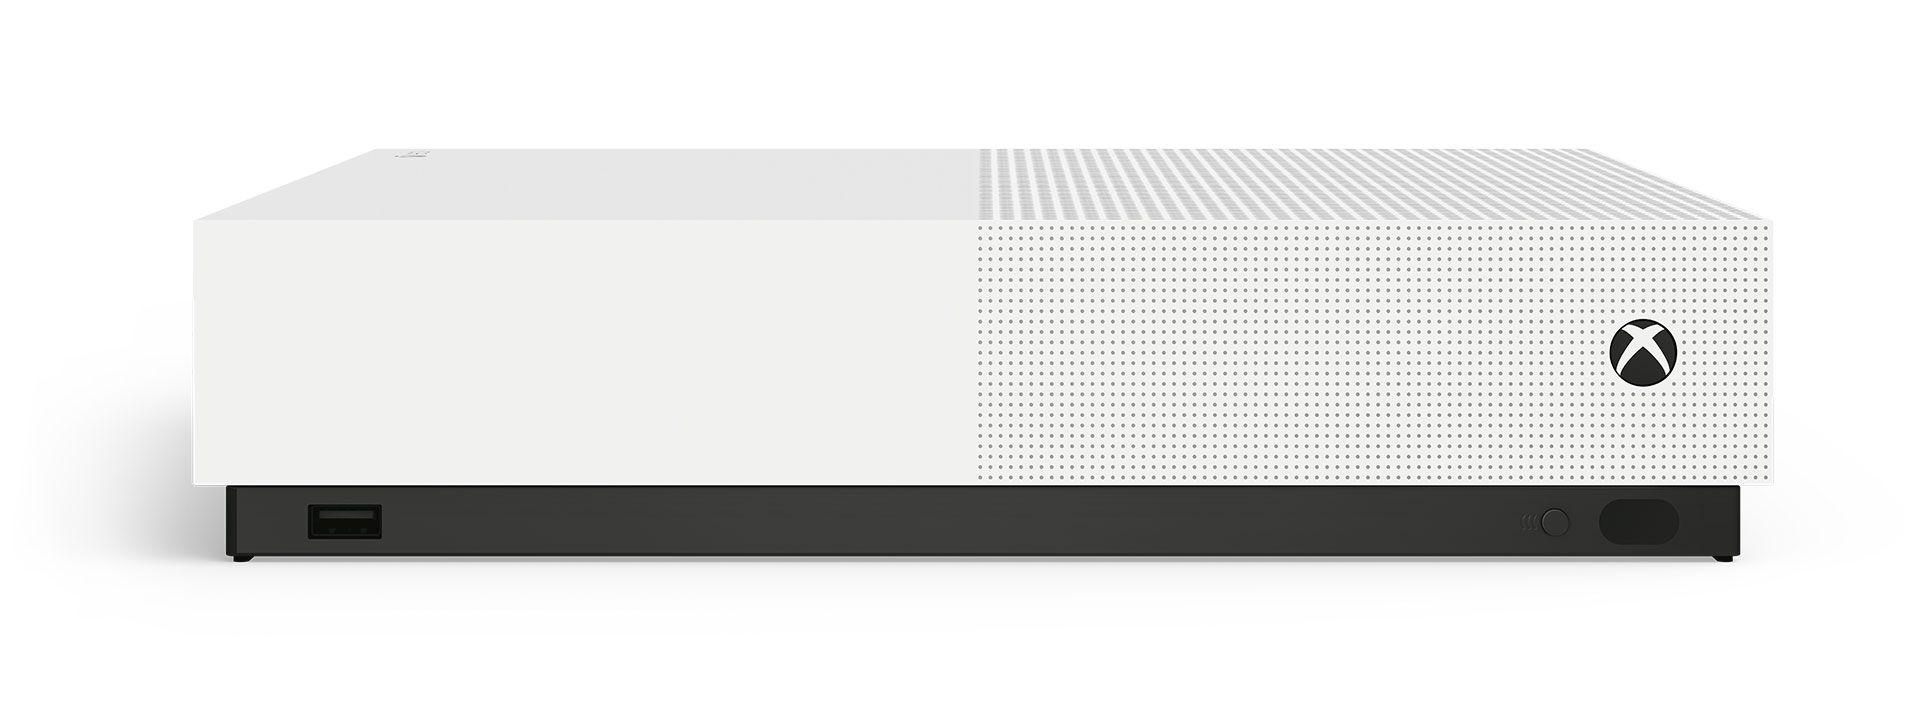 Console xbox one s all digital 1tb - branco